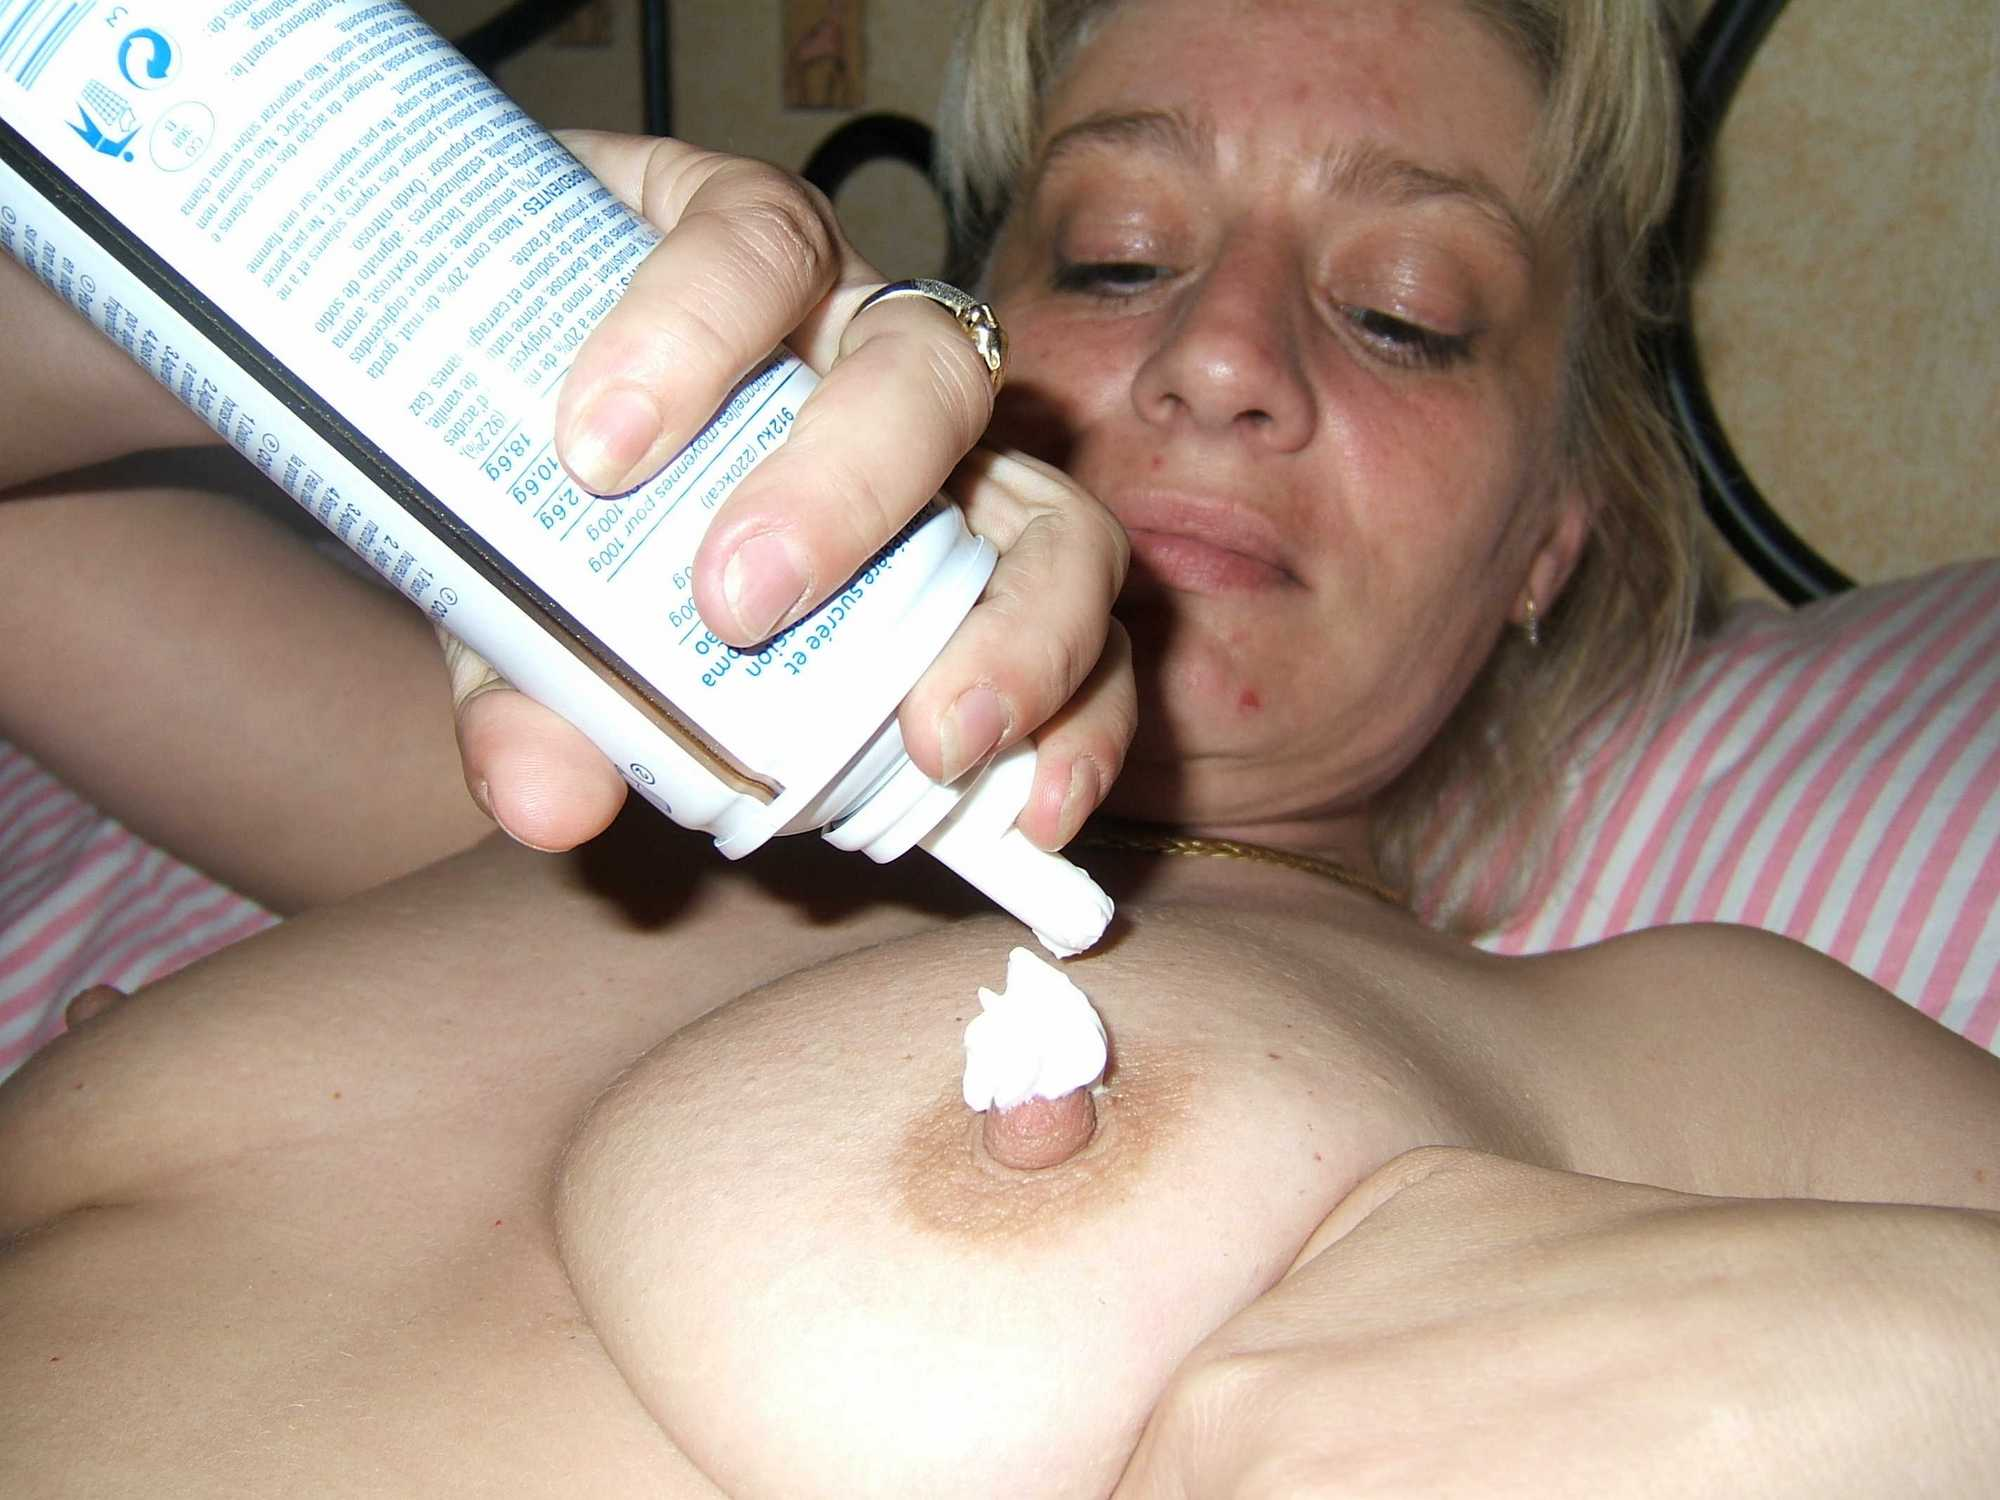 На кровати женщина засунула клубнику в письку